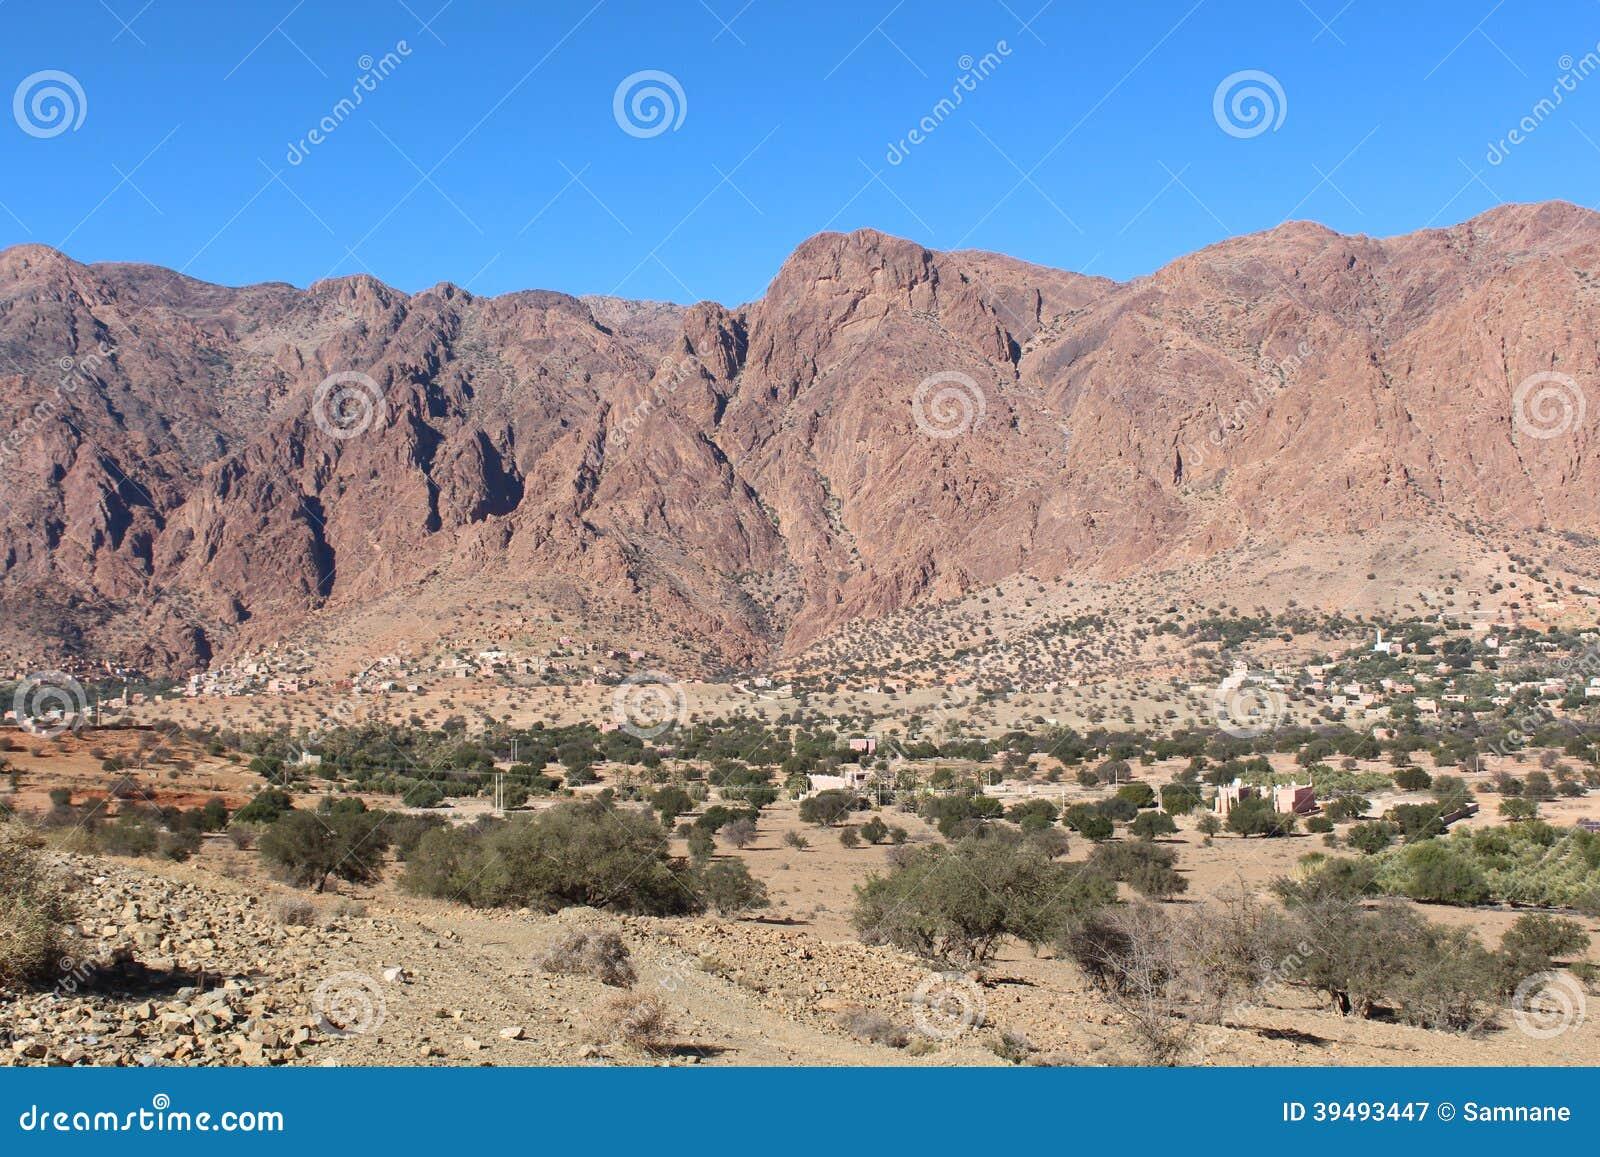 Desert stock photo image 39493447 for Architecture du paysage